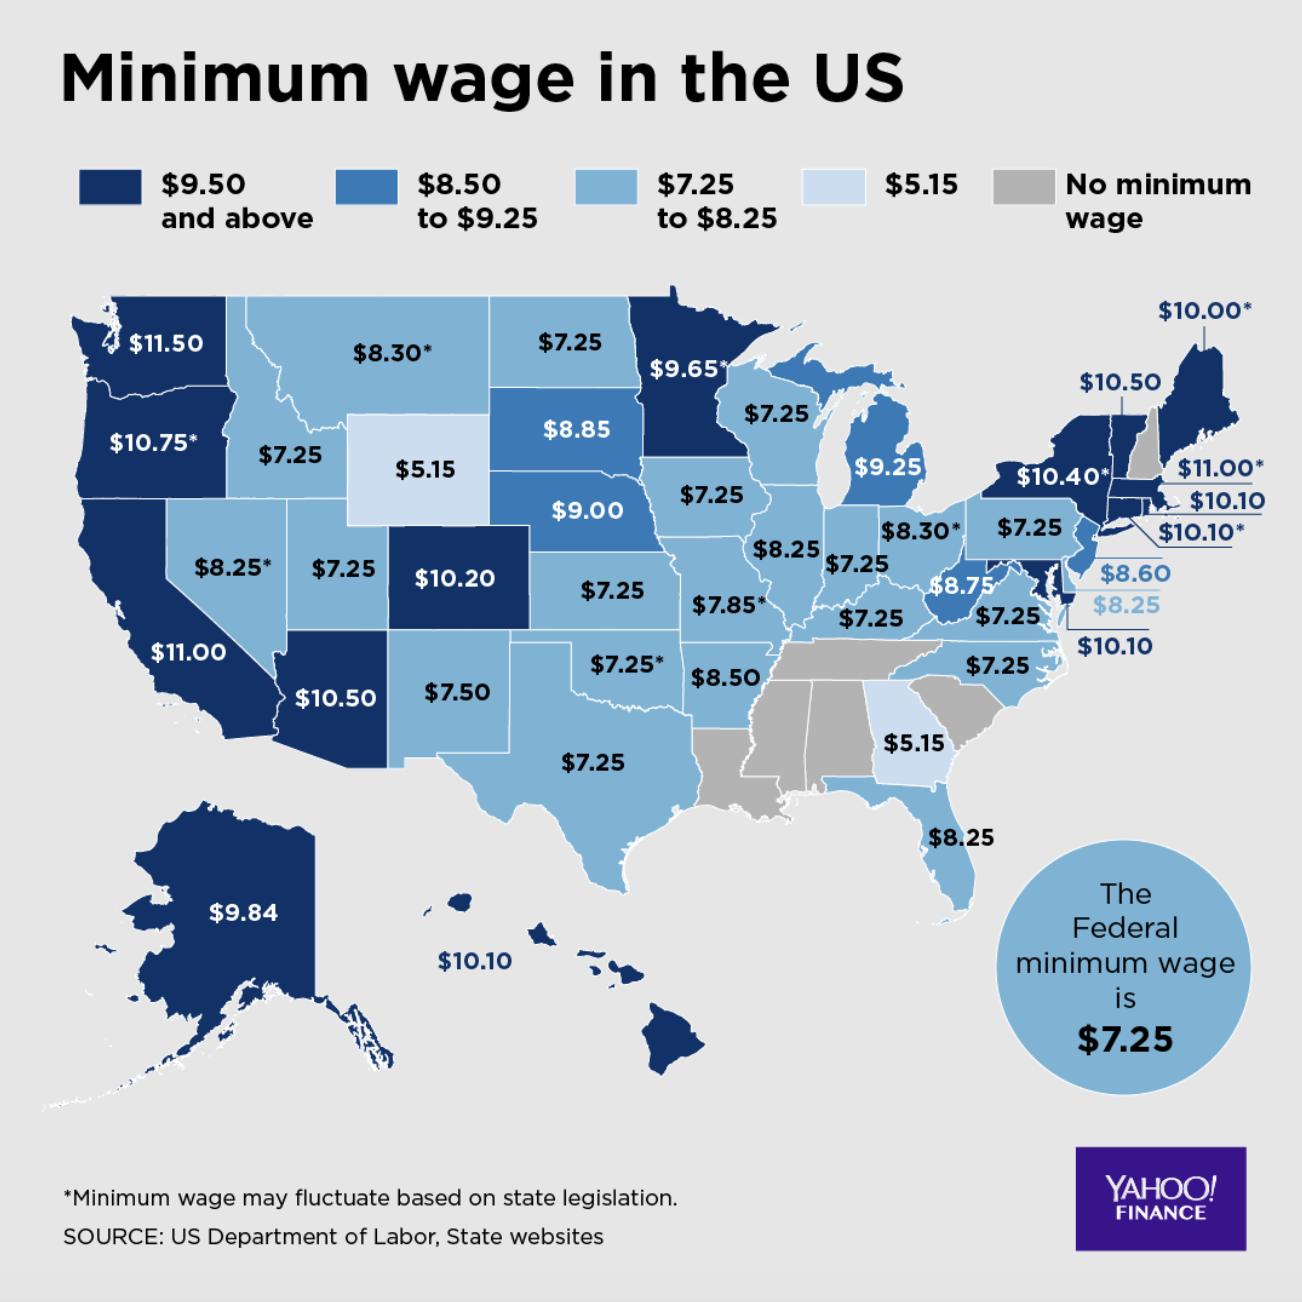 Minimum wage across the U.S. (Source: David Foster/Yahoo Finance)